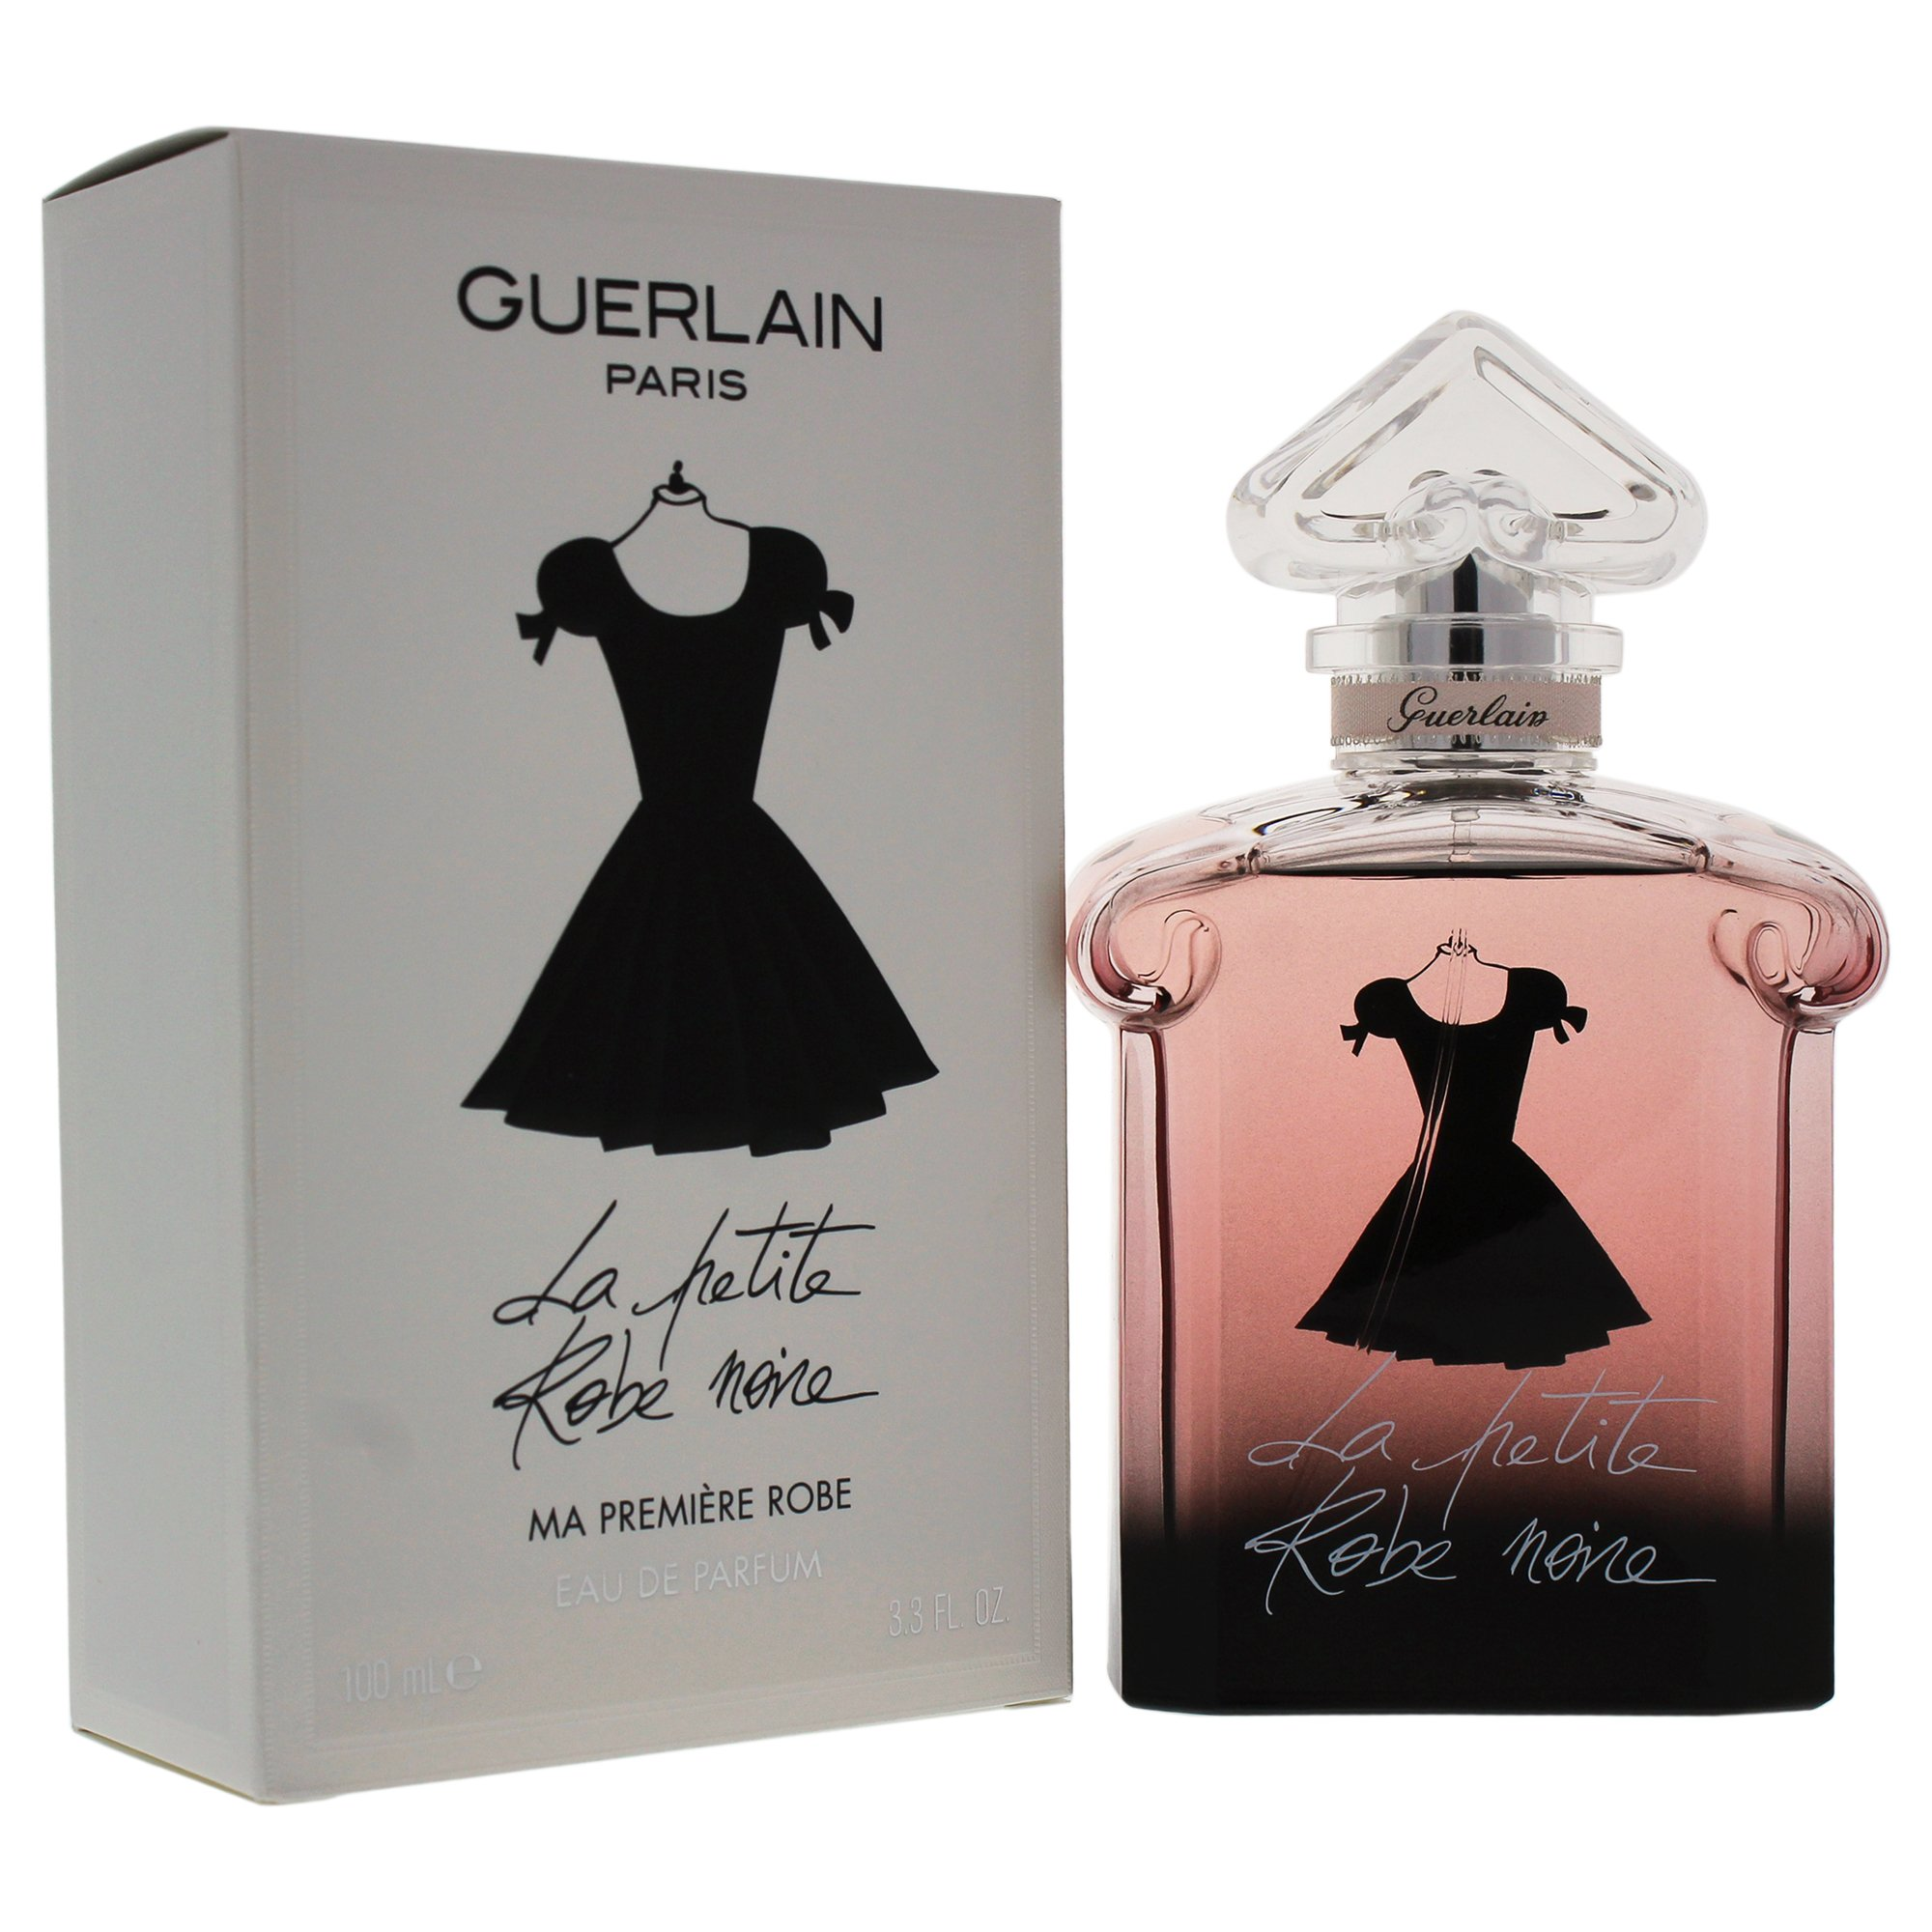 guerlain perfume. Black Bedroom Furniture Sets. Home Design Ideas